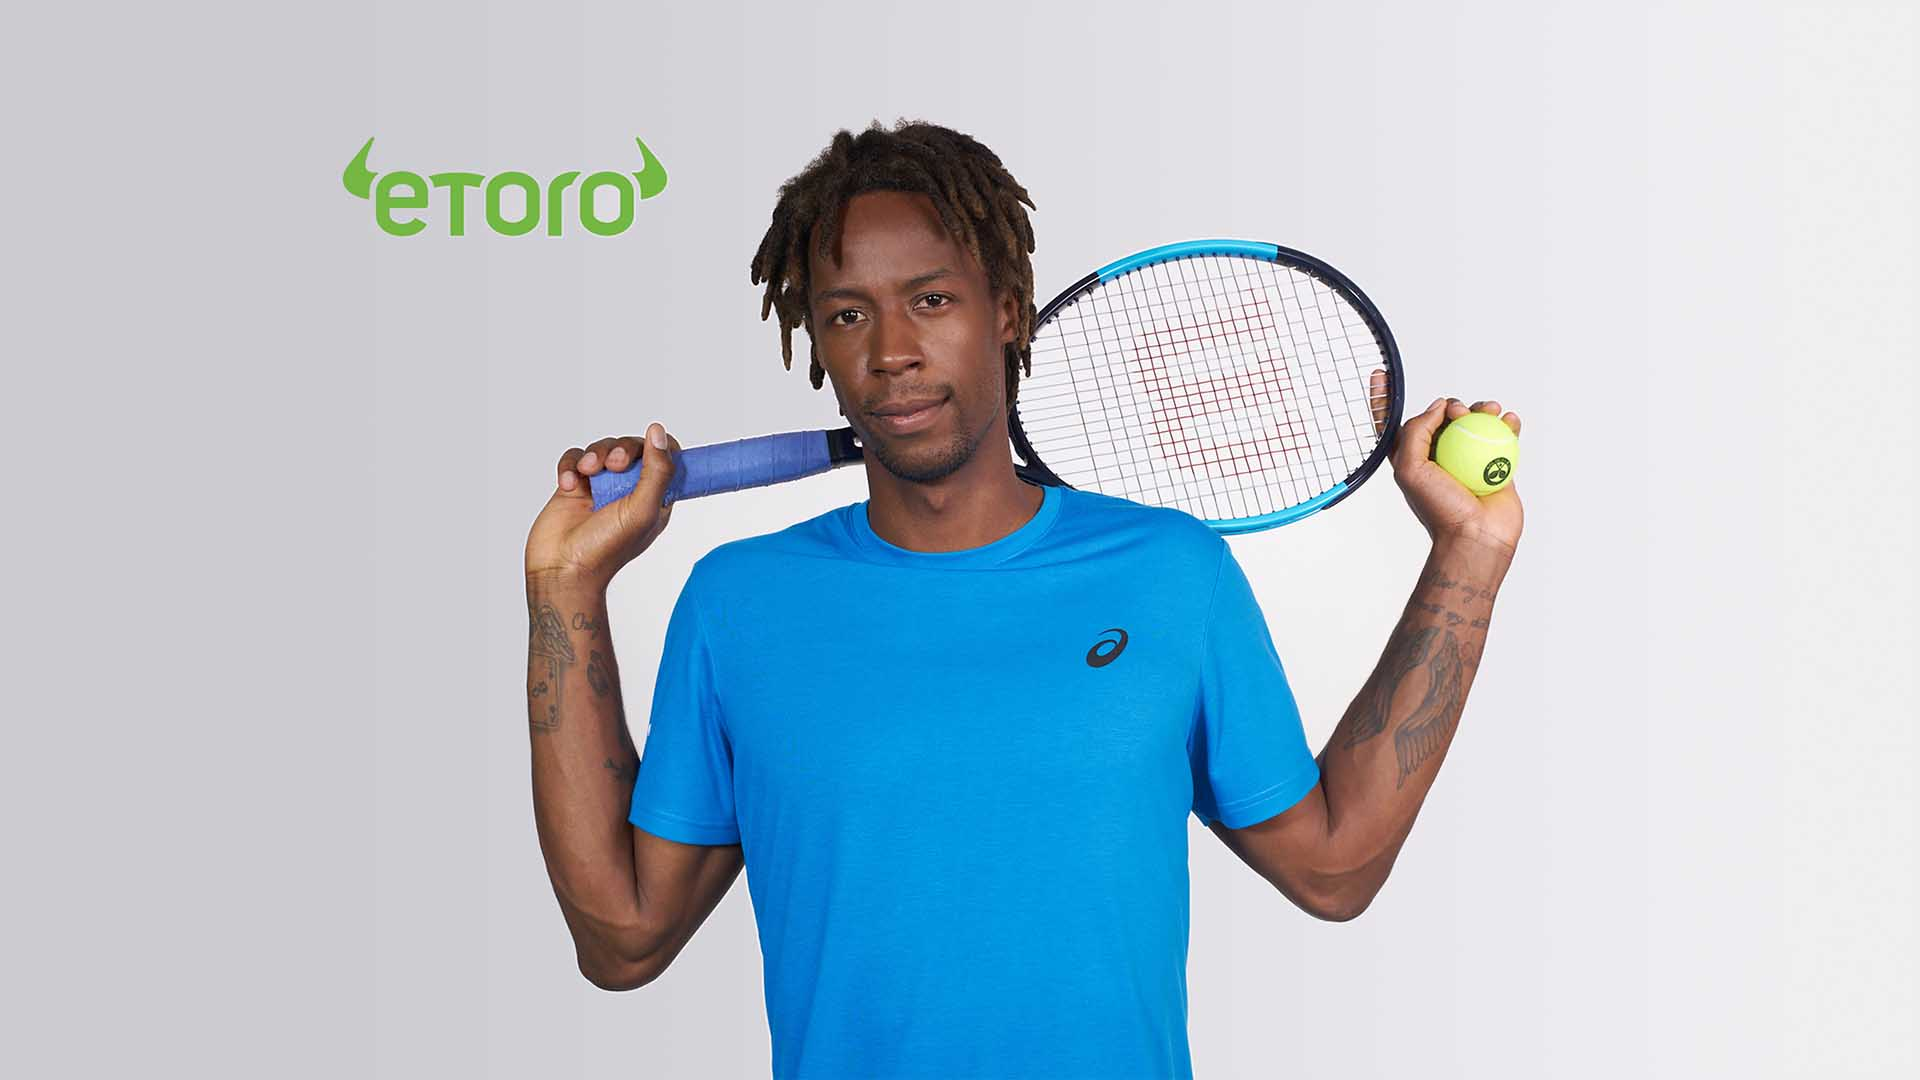 Monfils Sponsorship with eToro